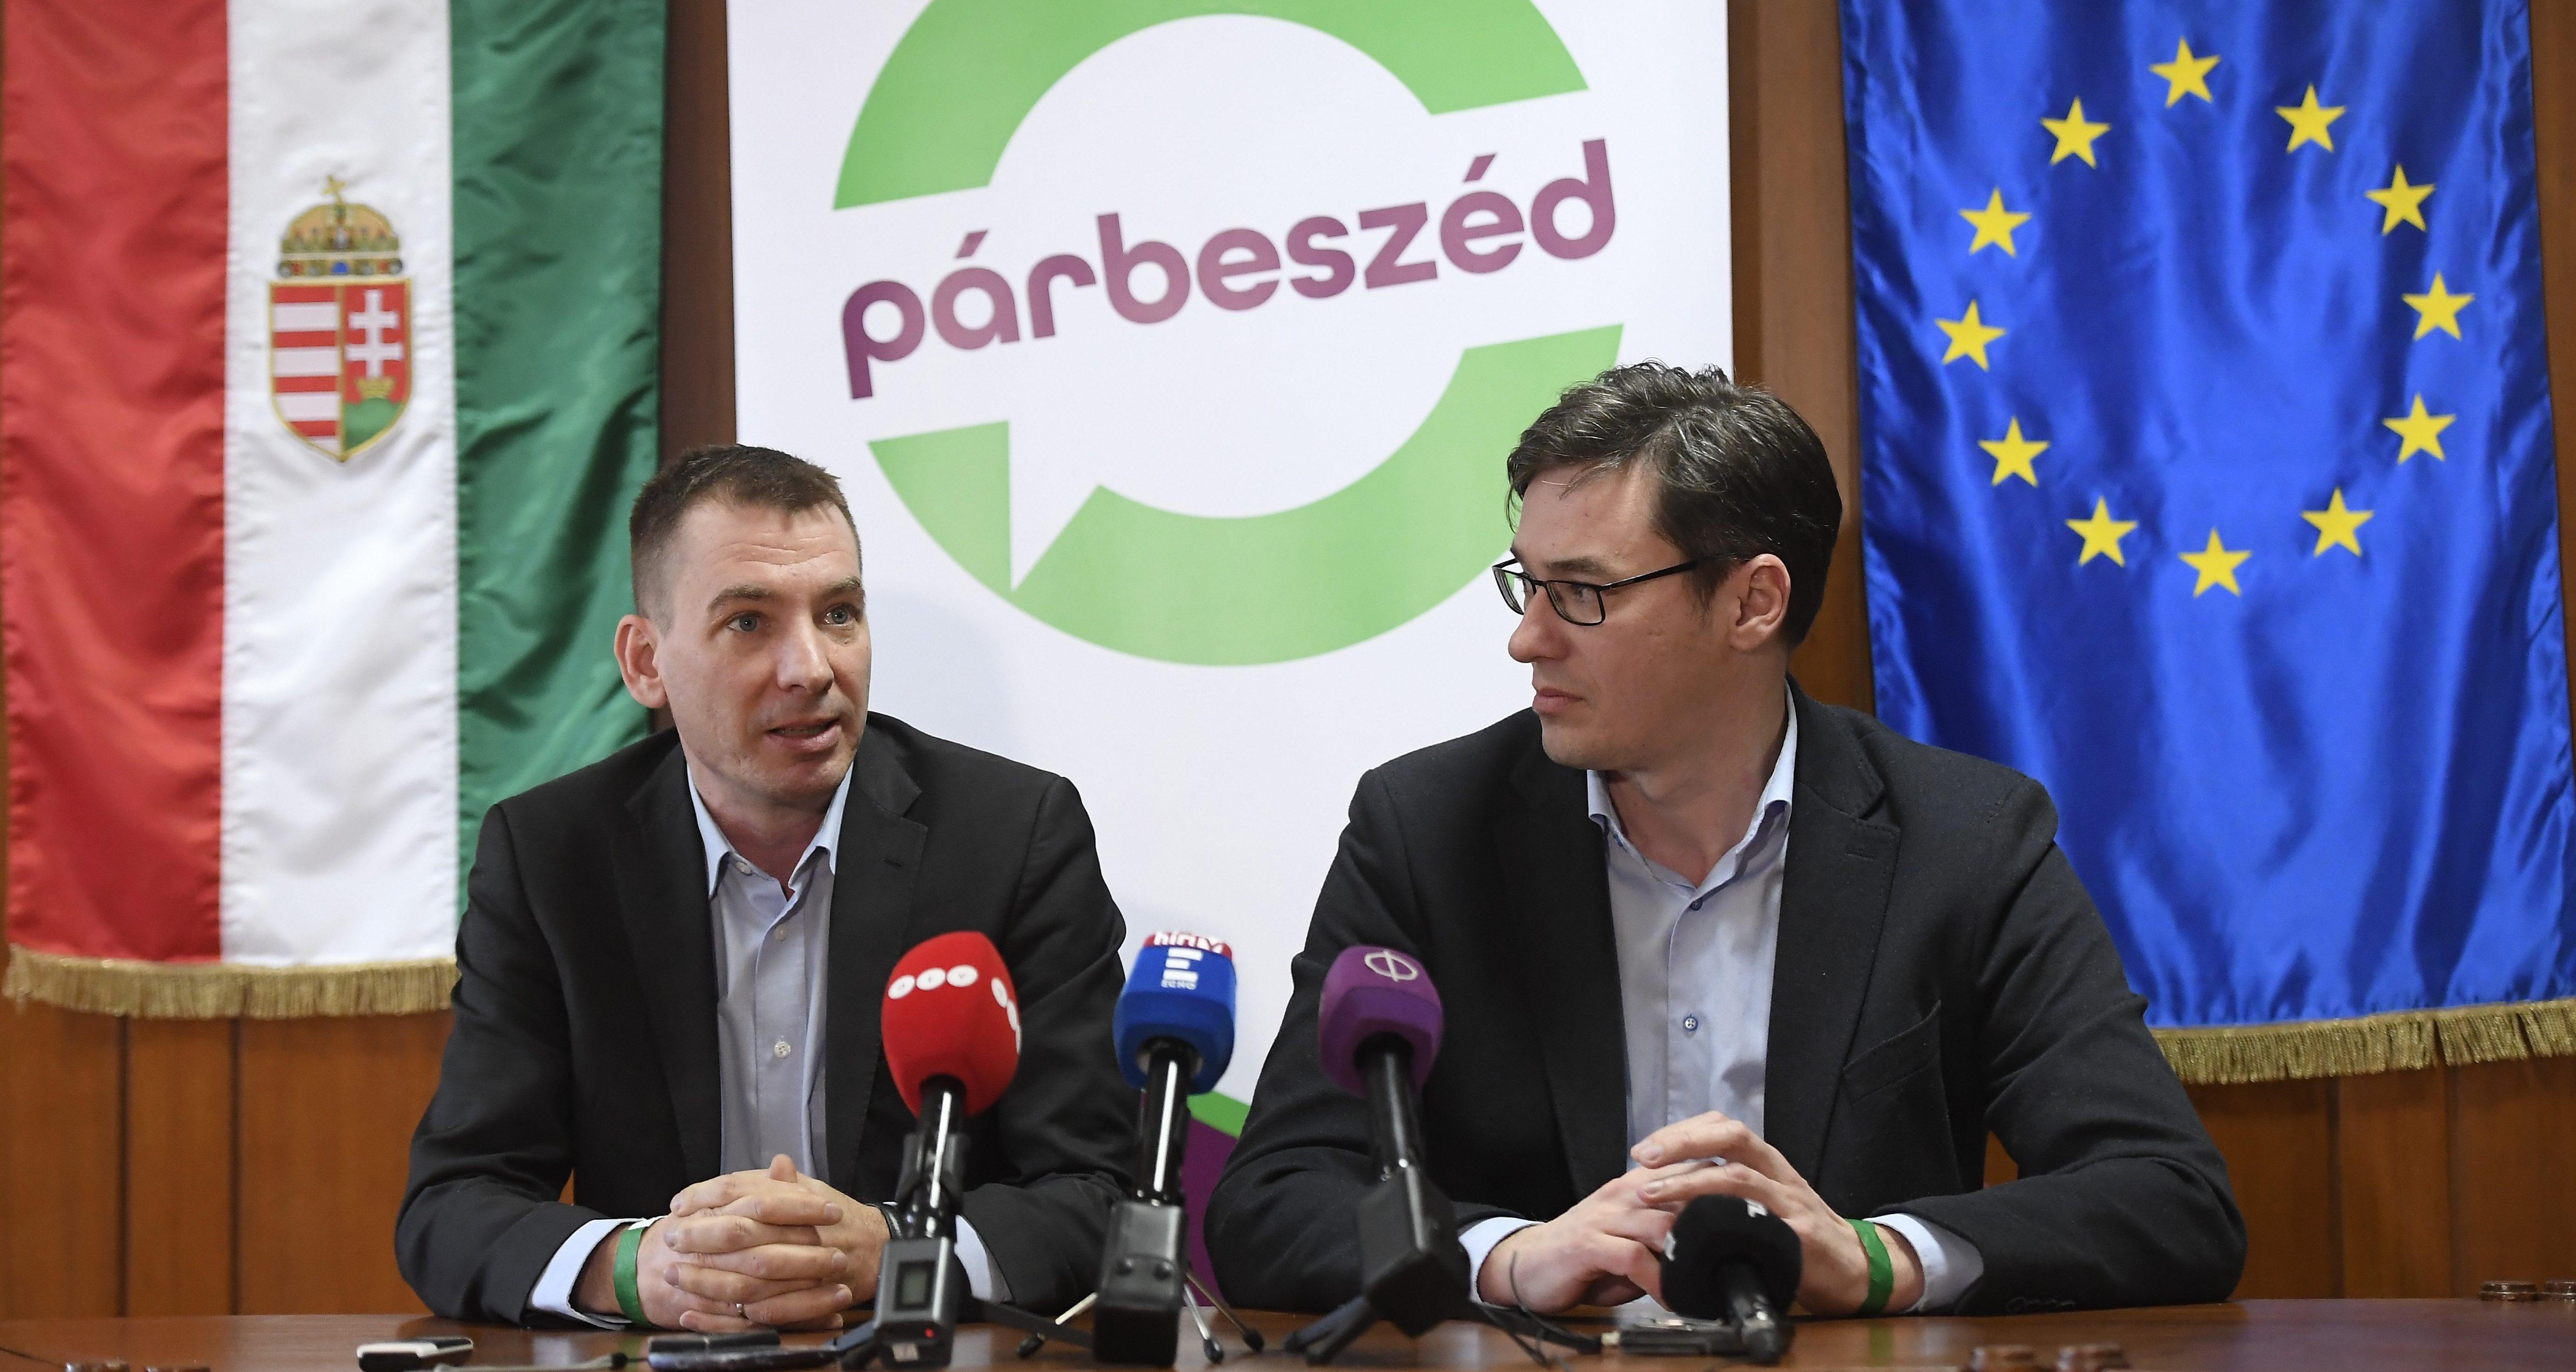 Jávor KArácsony EP ELECTION 2019